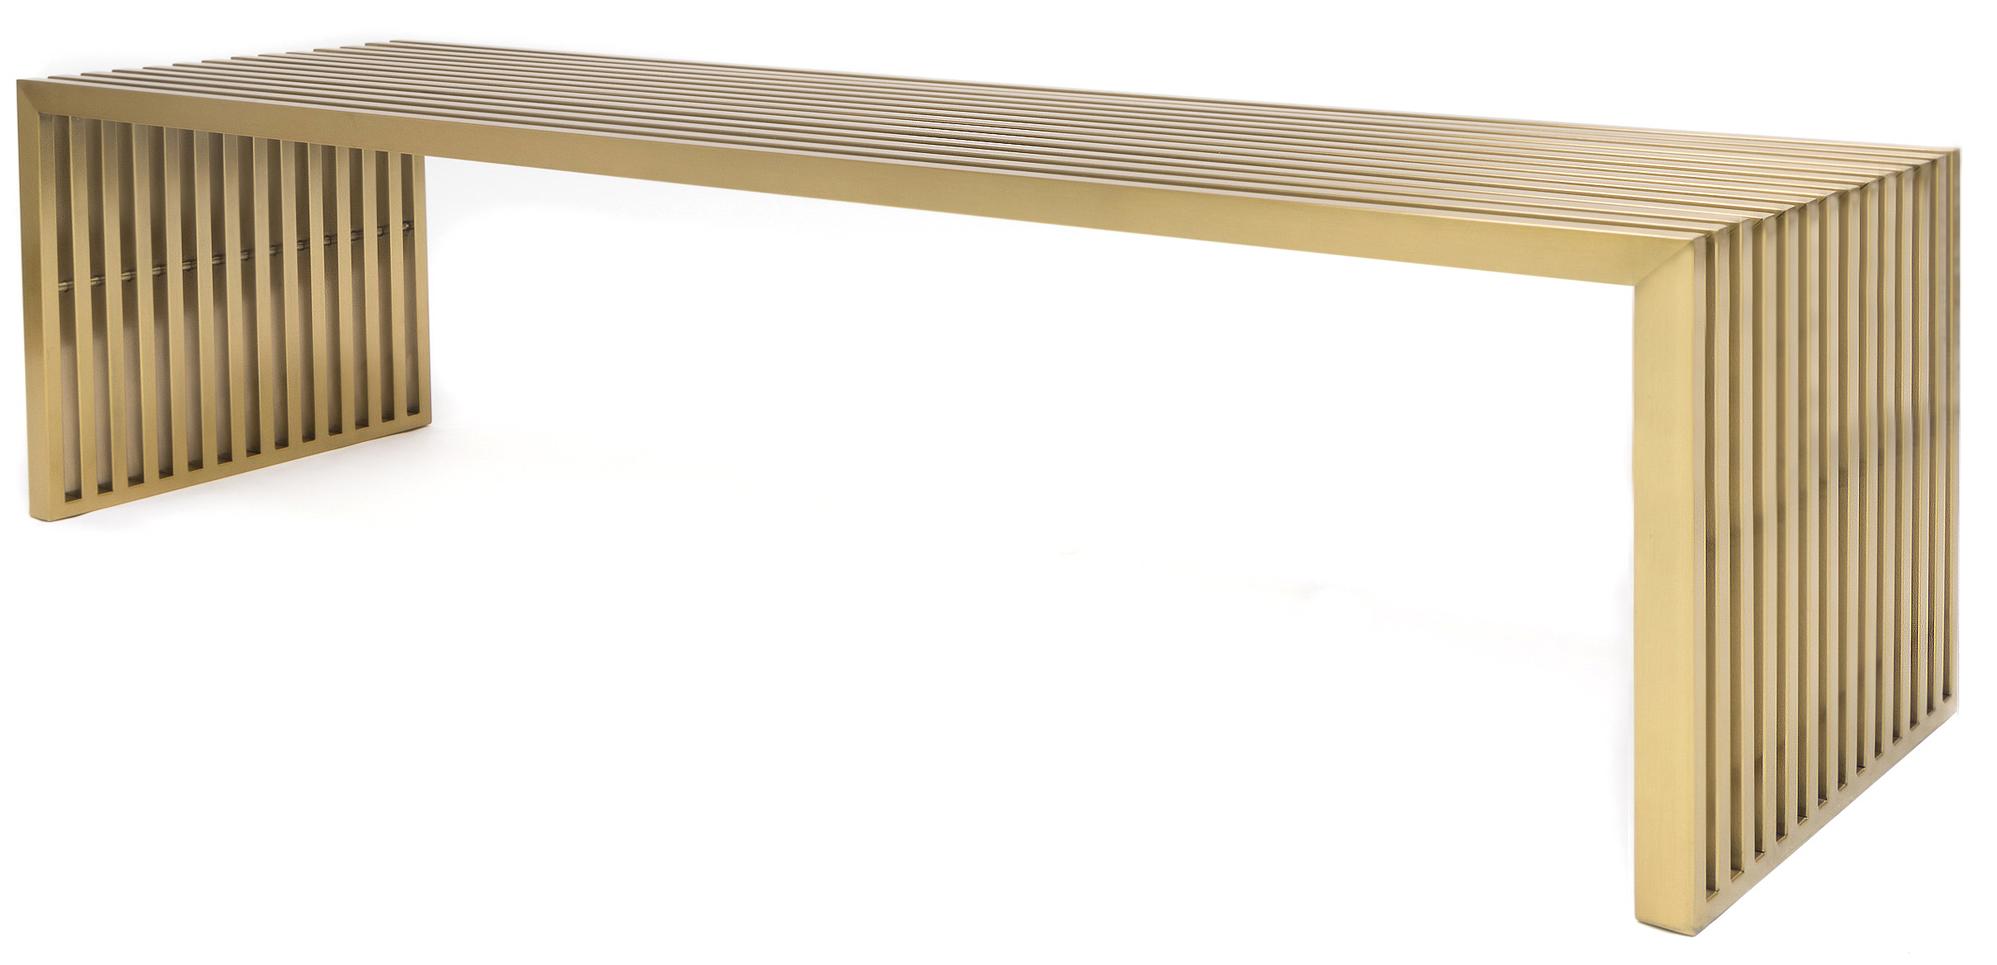 chi-brushed-gold-bench.jpg